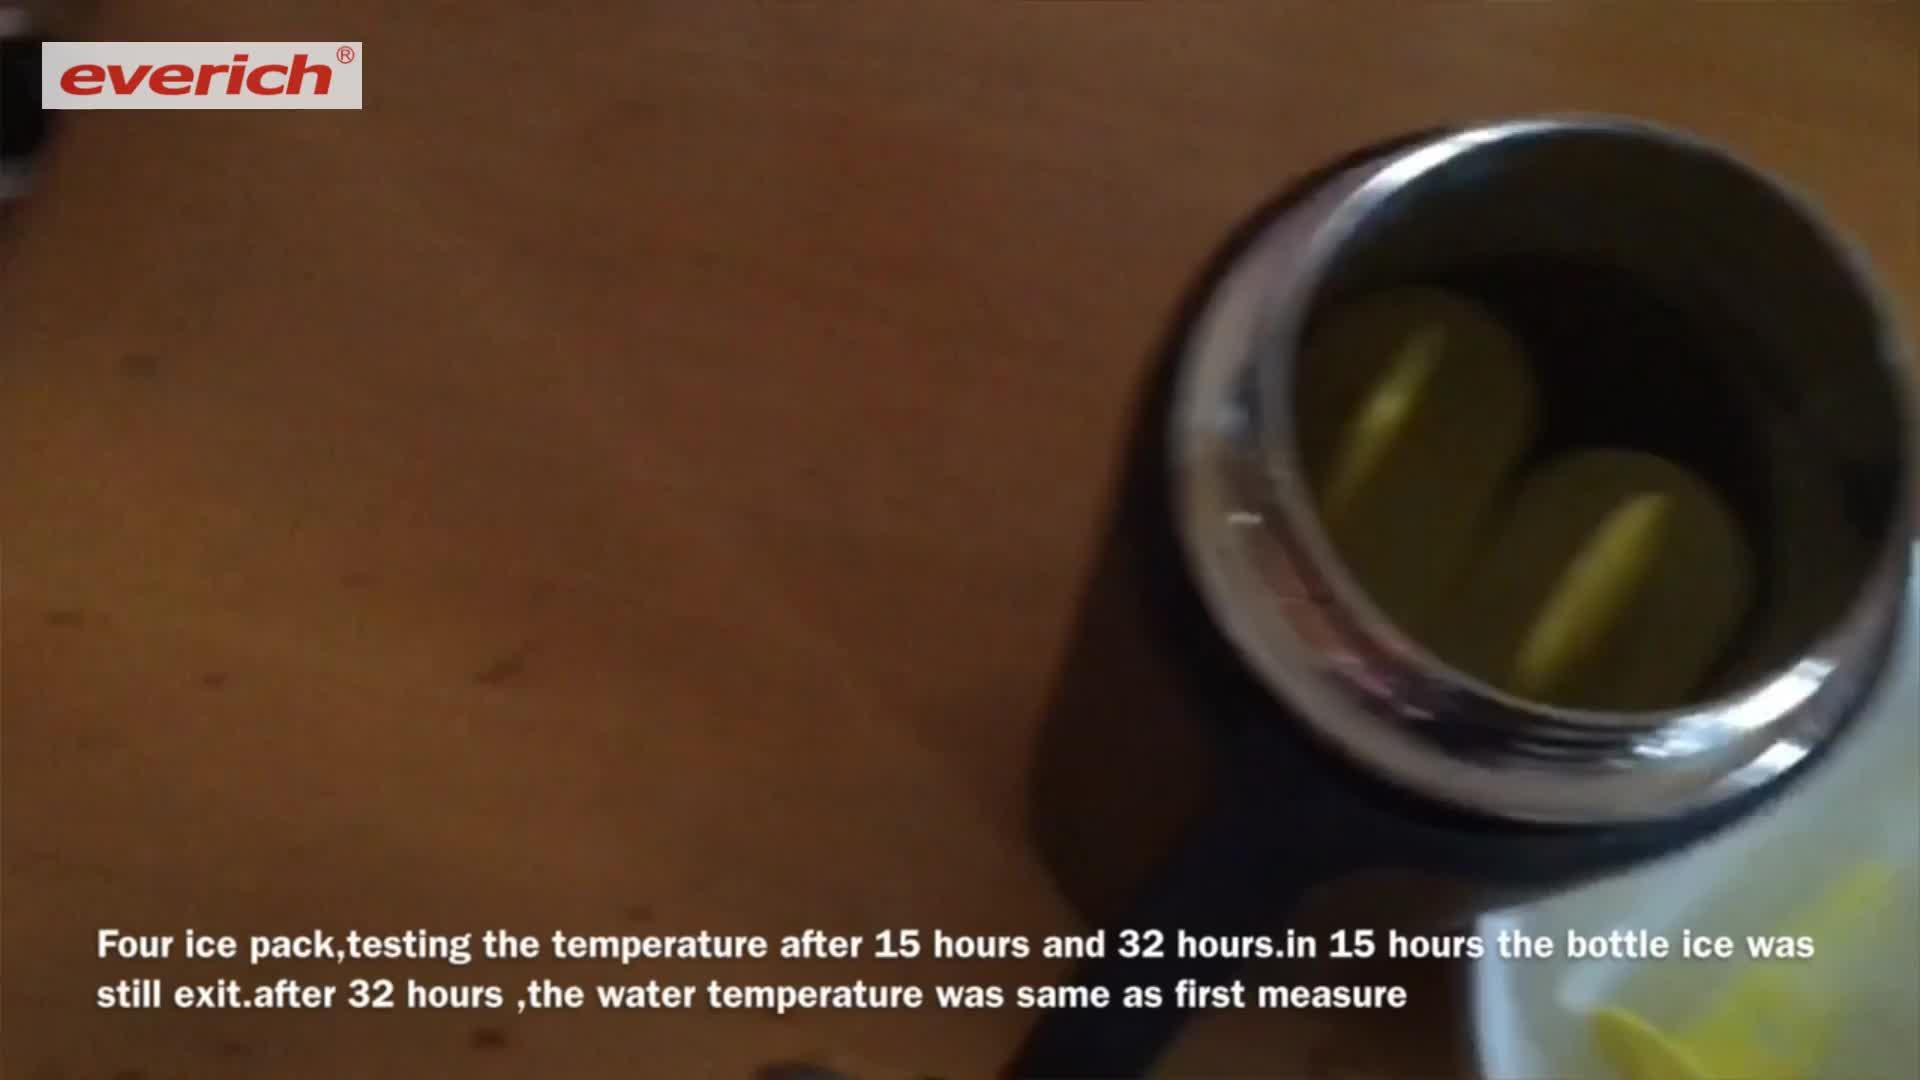 De alta calidad de doble pared/128/64 oz botella de agua vacía botella de agua mineral de acero inoxidable botella de cerveza enfriador